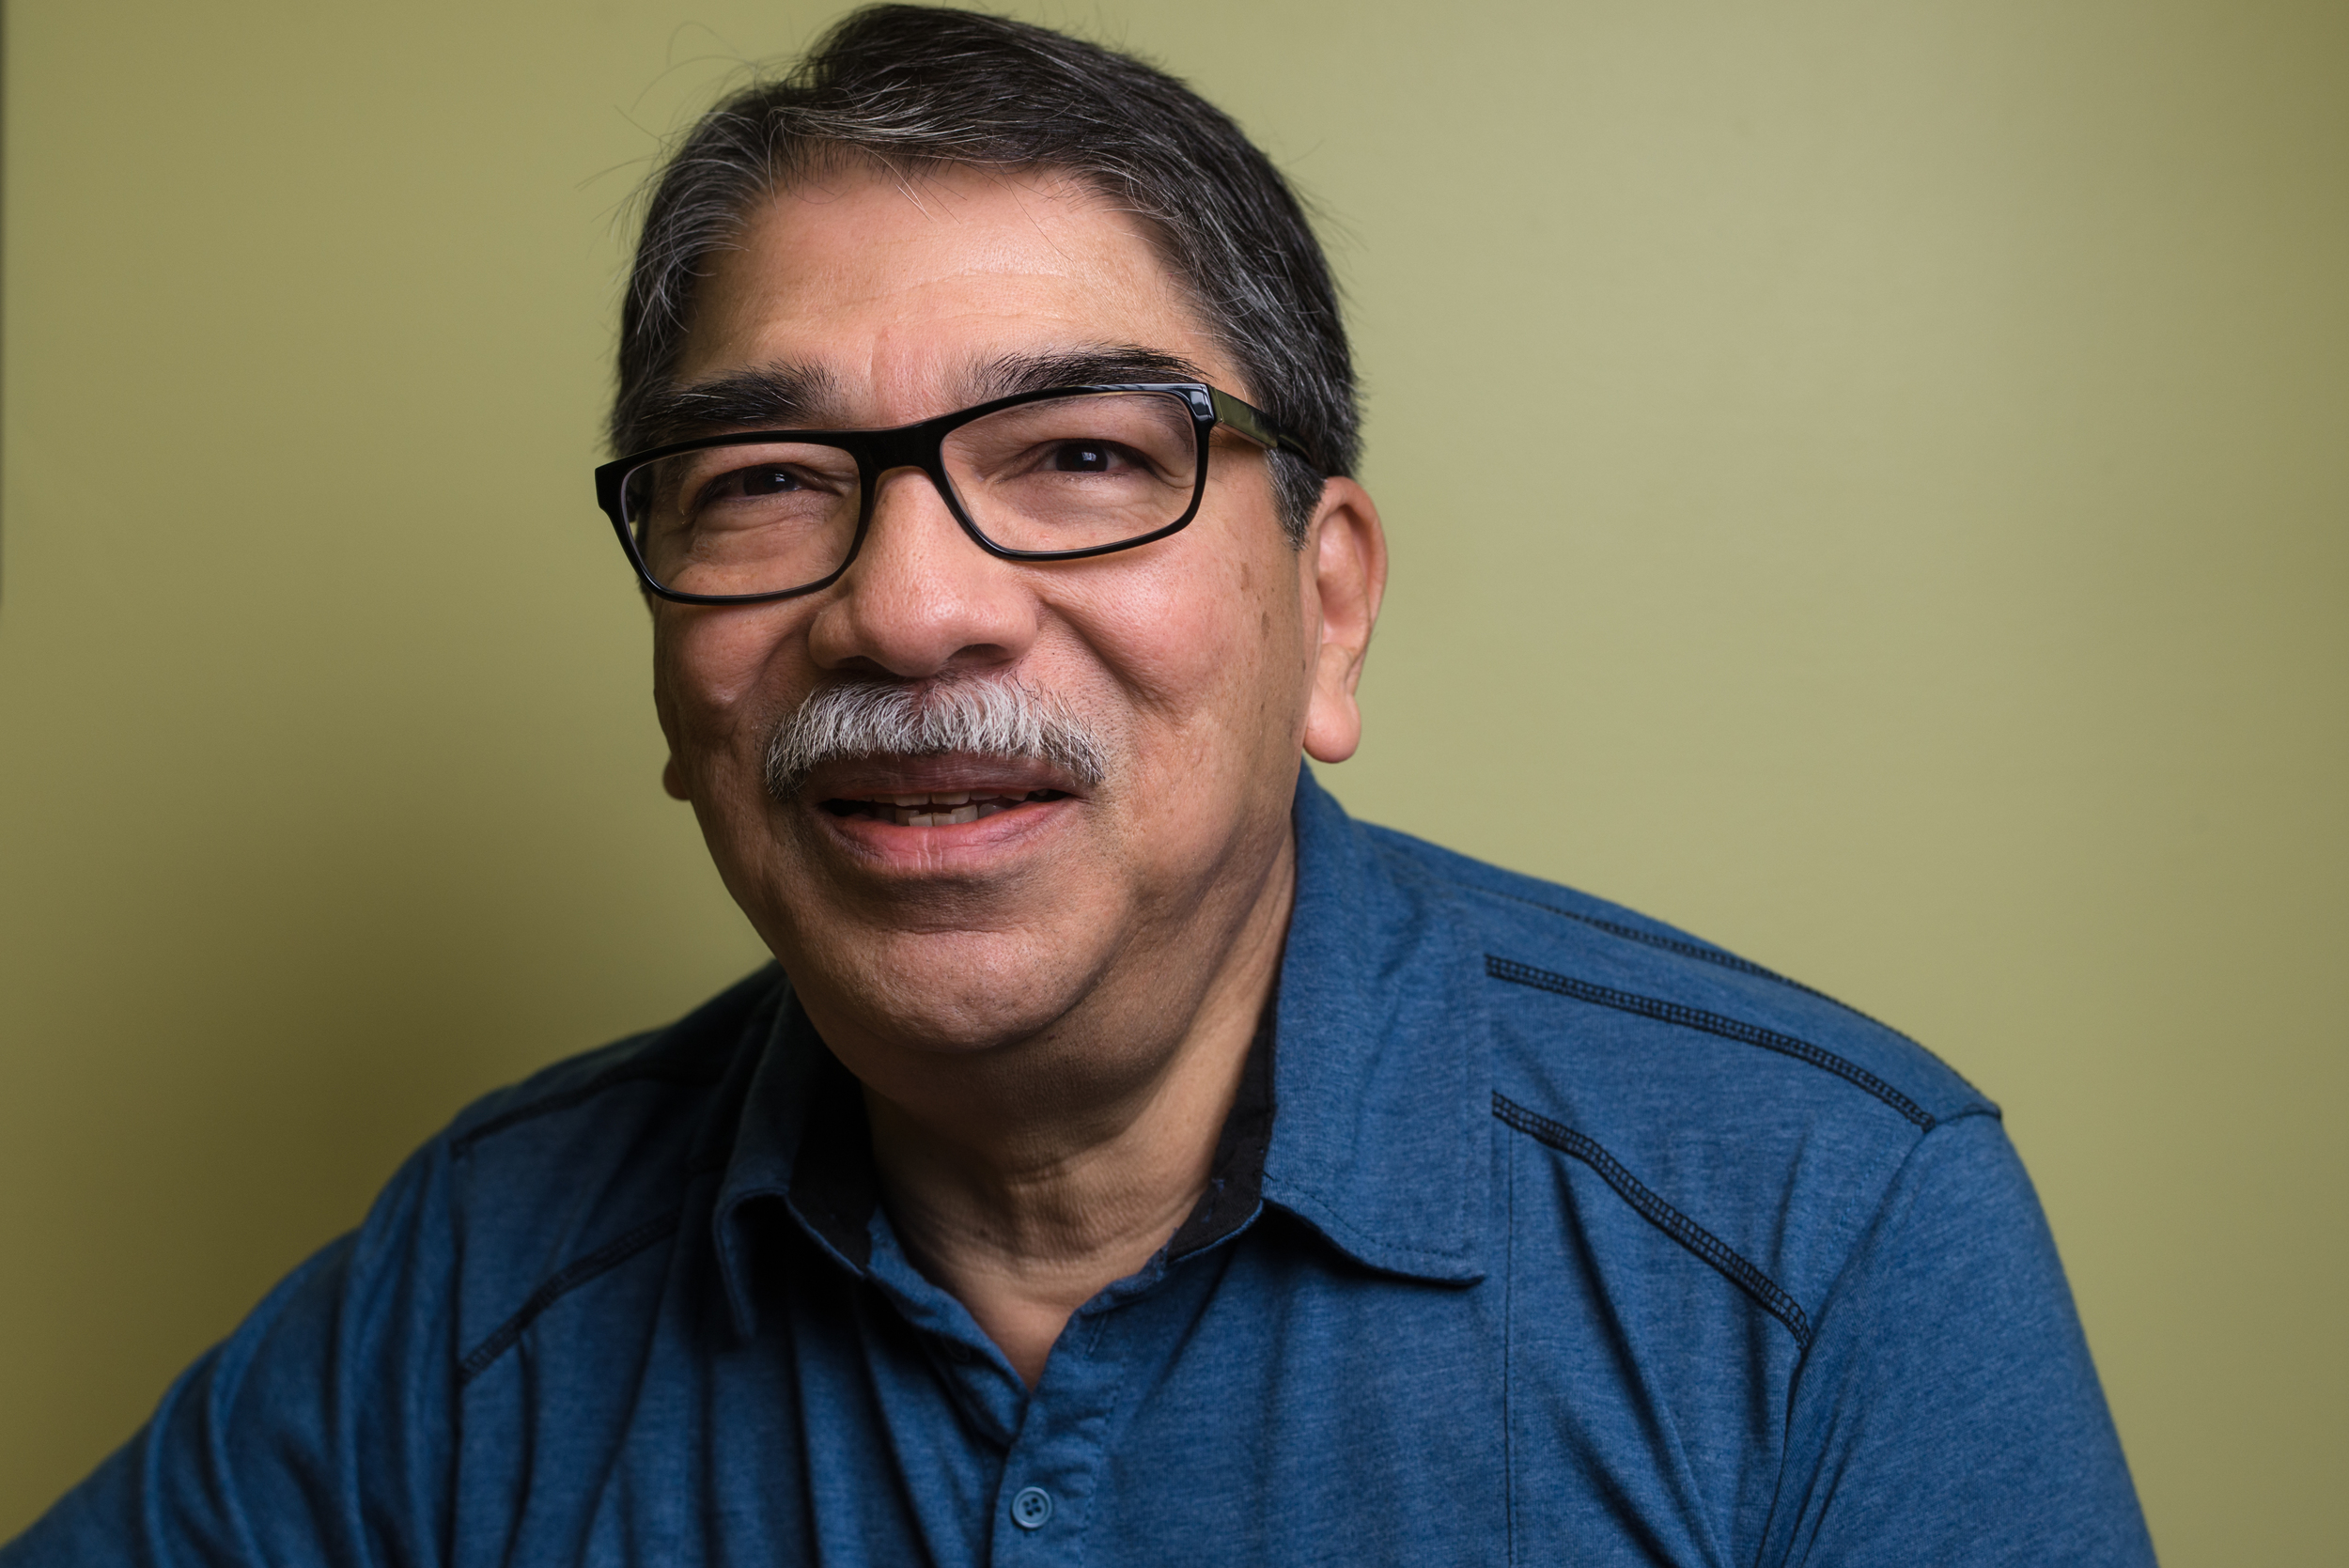 David Ramirez, Treasurer